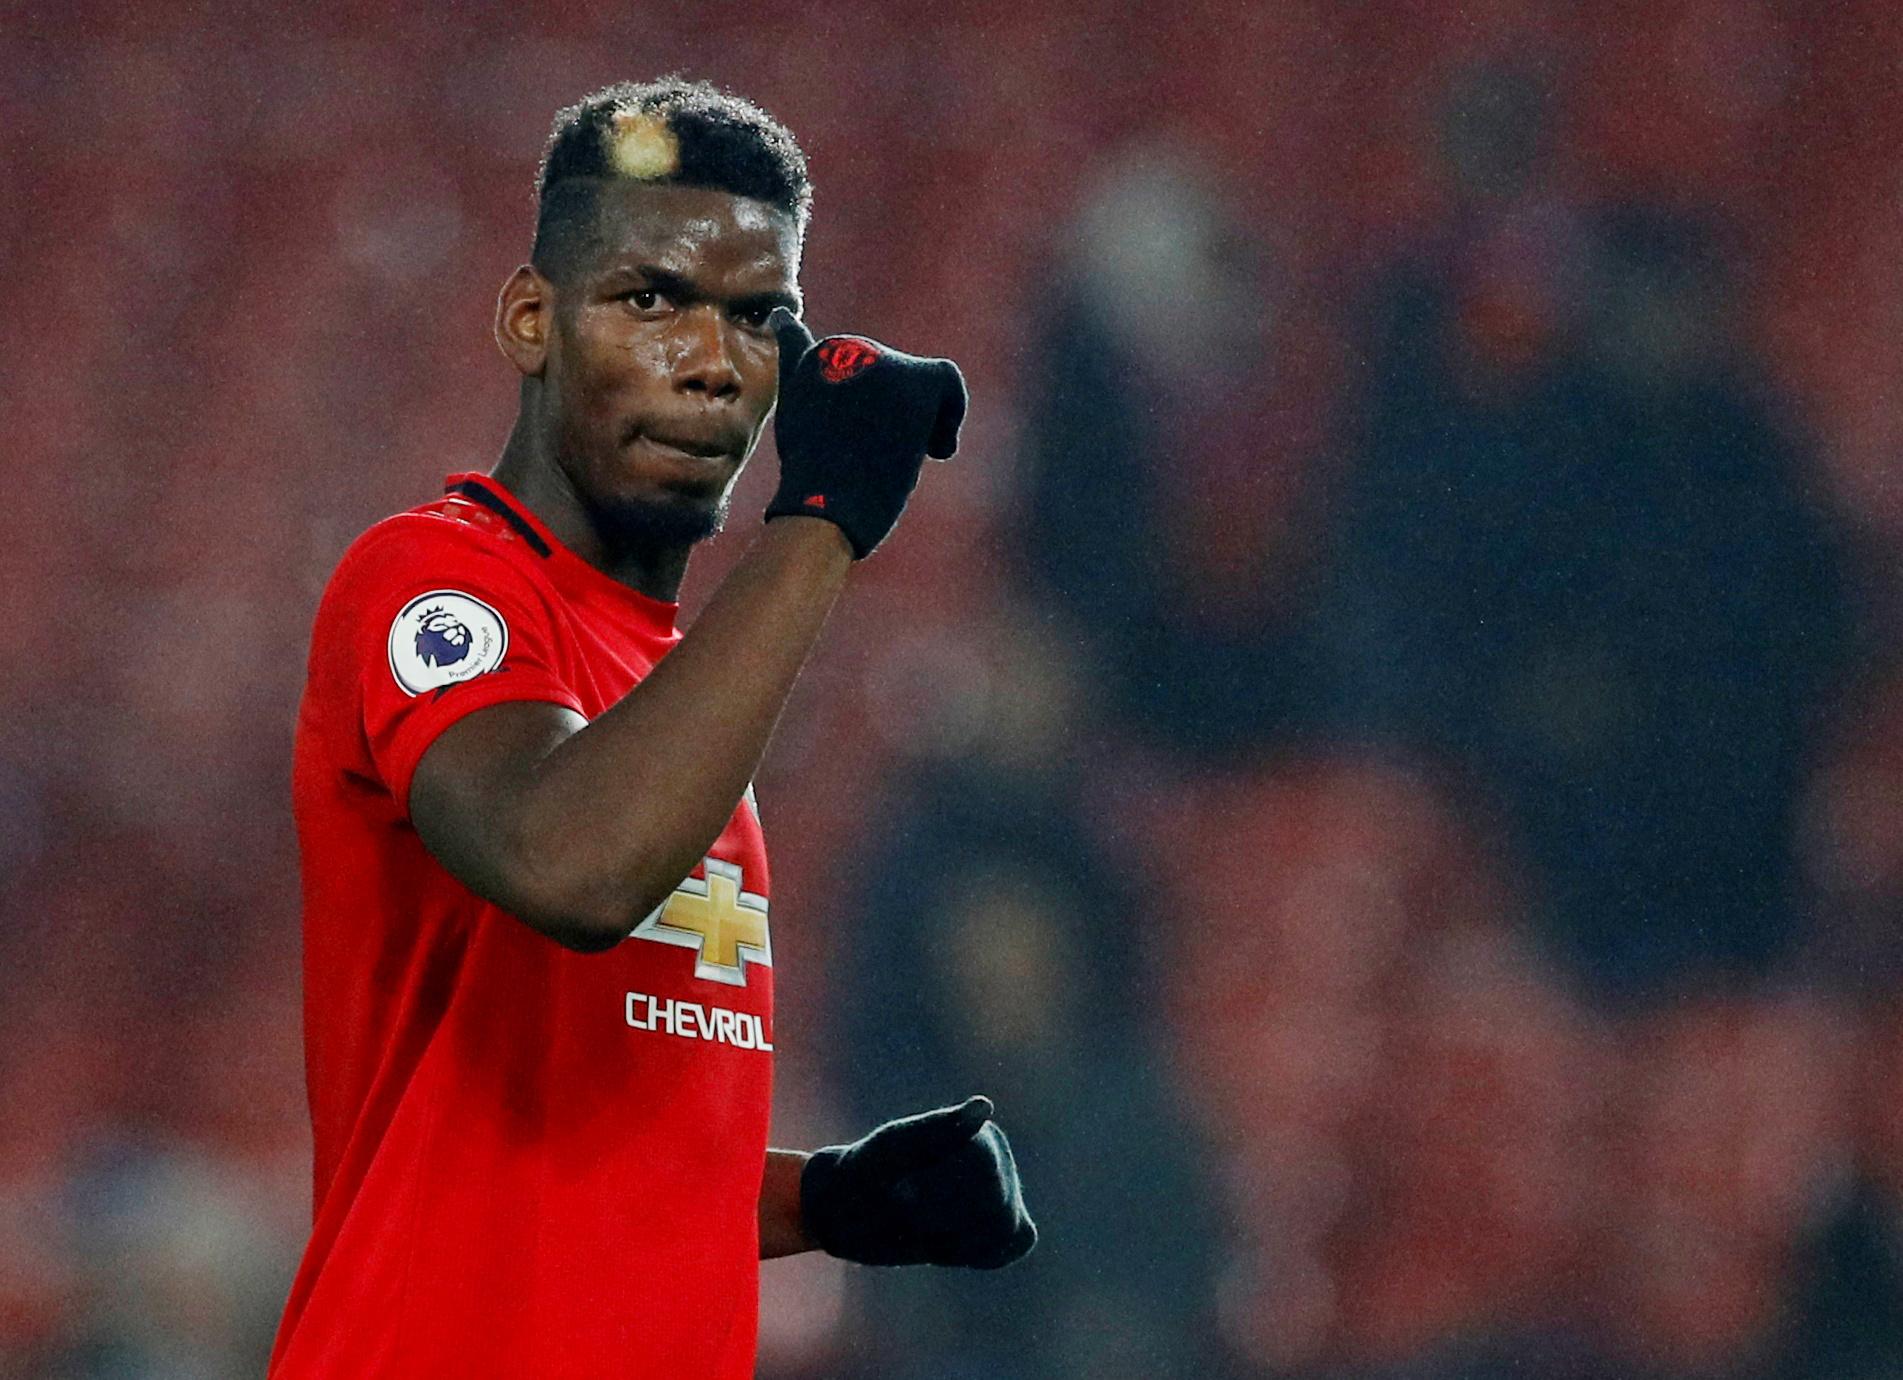 Football - Transferts - Le journal du mercato : Pogba va rester à Manchester selon un de ses ex-coéquipiers